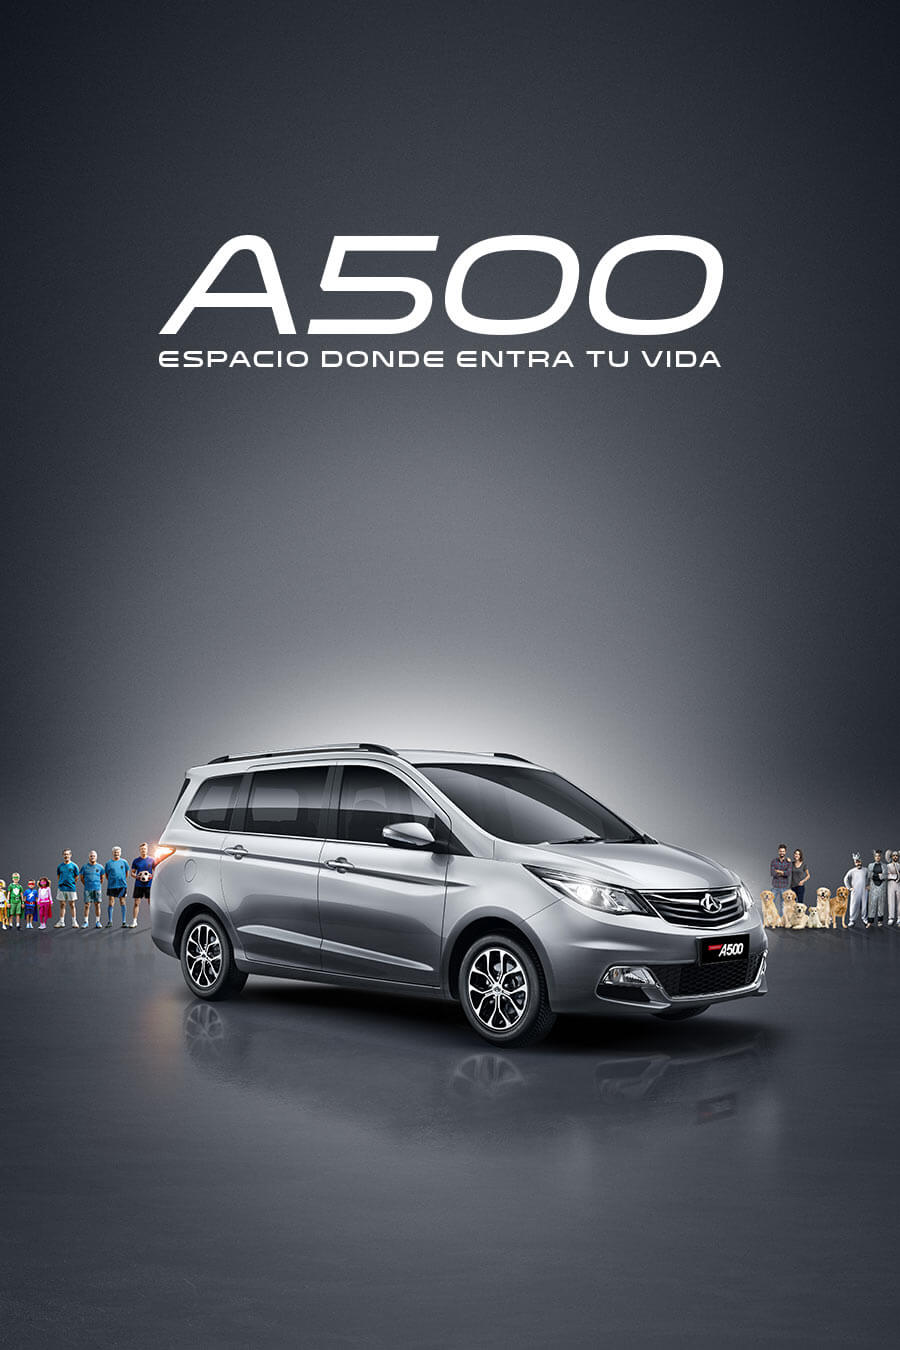 a500-Mobile